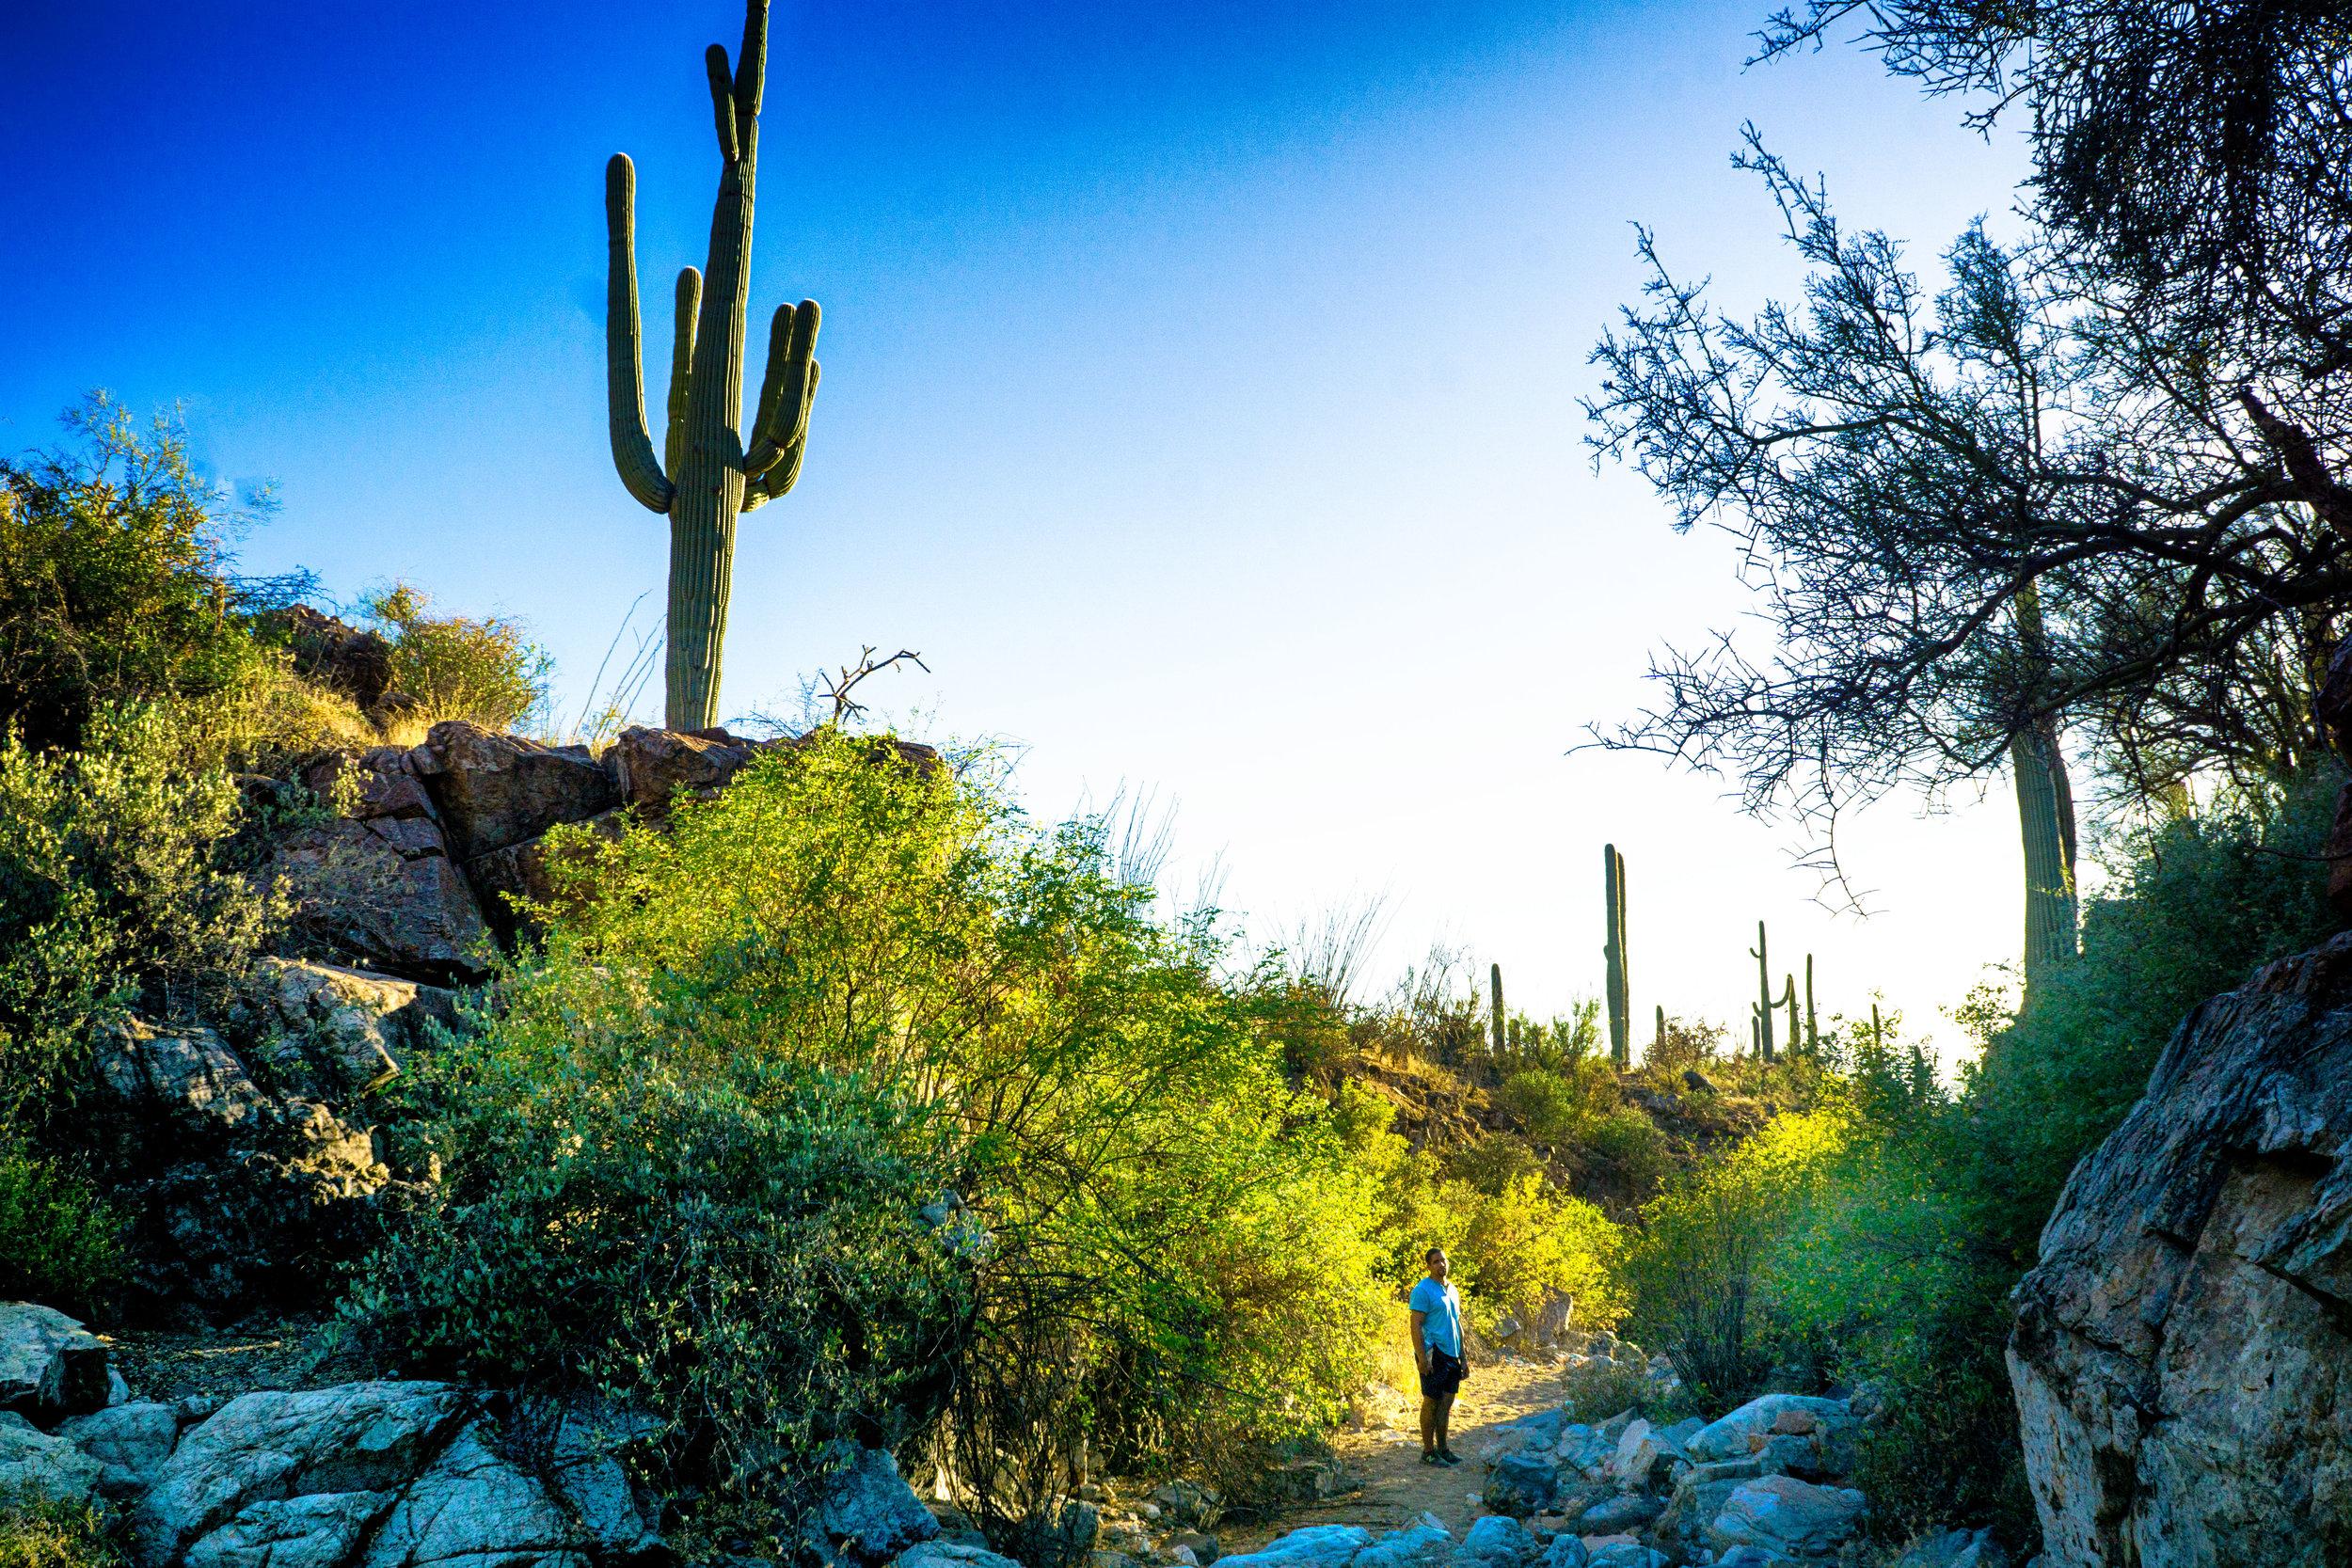 vickygood_photography_nature_saguaro-park9.jpg